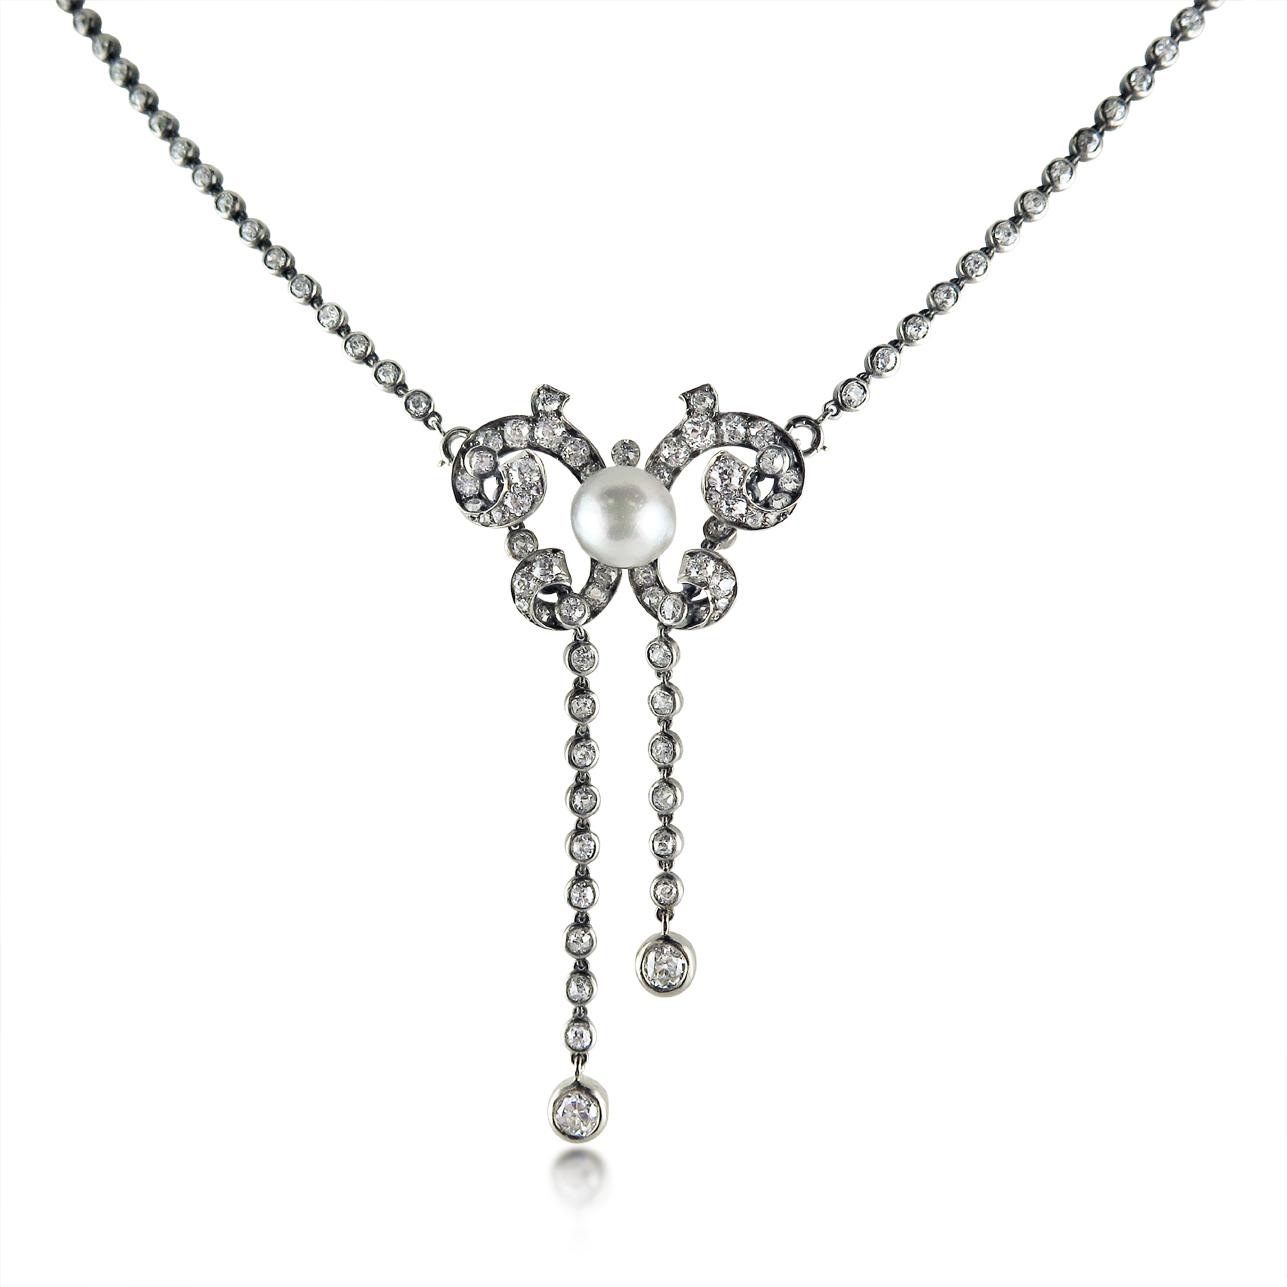 EDWARDIAN PEARL AND DIAMOND LAVALIERE, HUMPHREY BUTLER